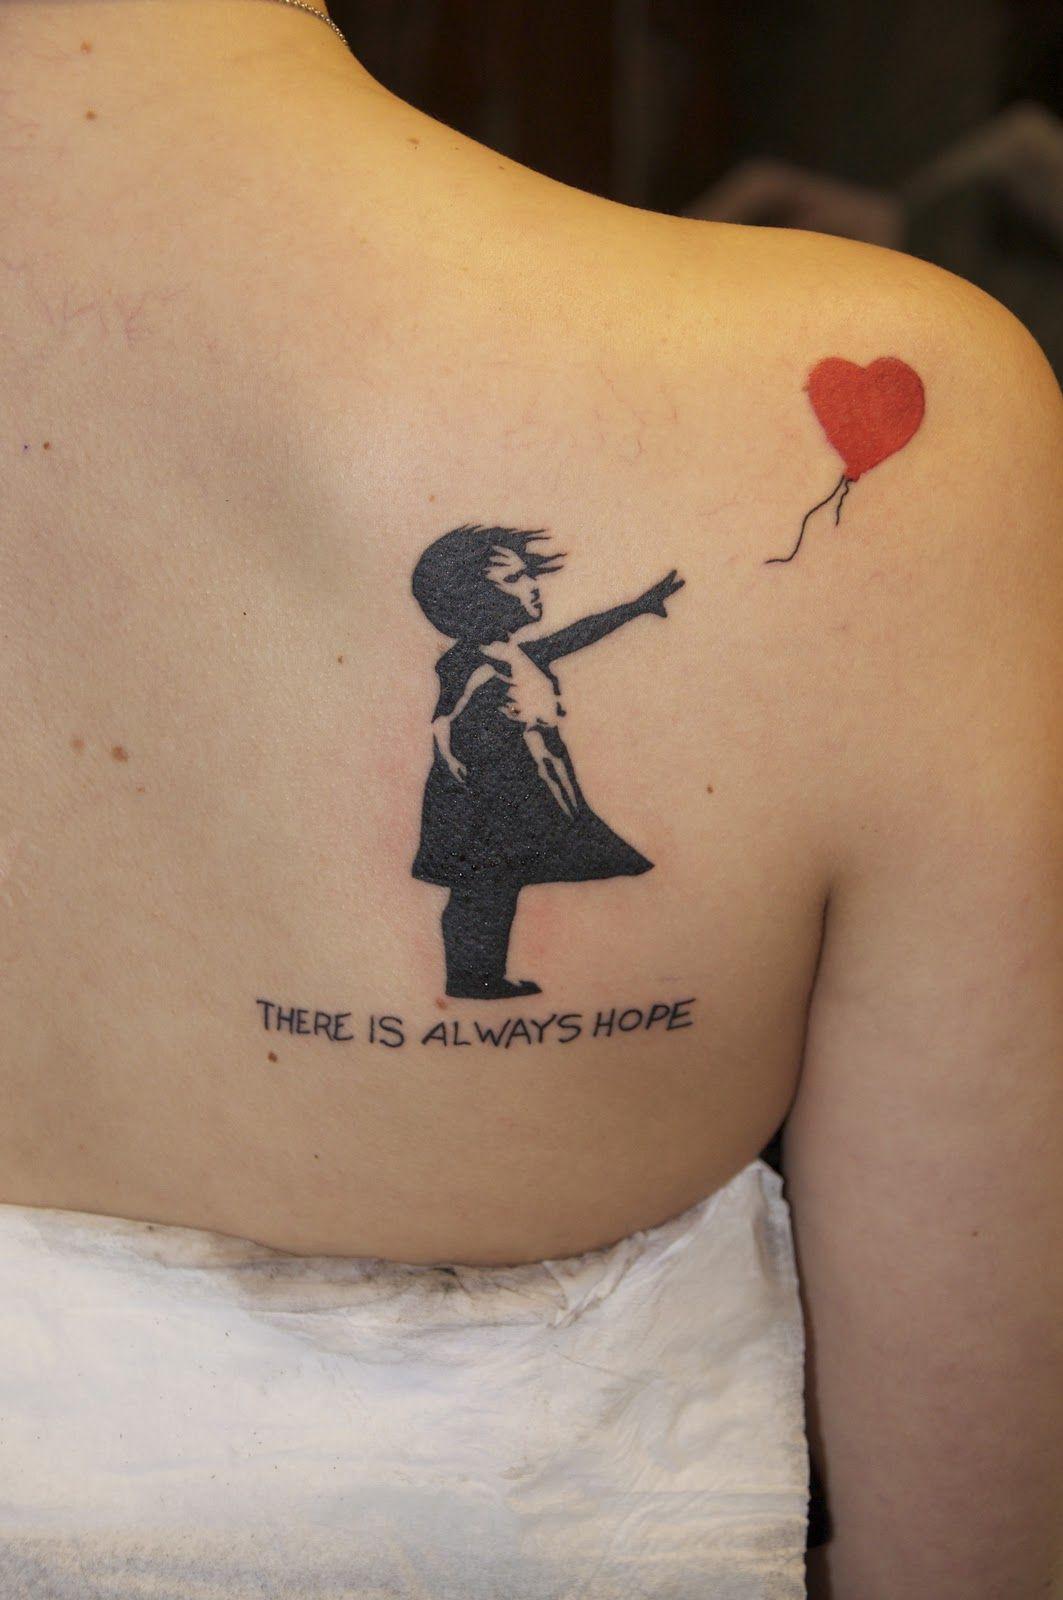 5afbec39b plain pain tattoo: Tatuering: skuldra.Banksy.There is always hope ...